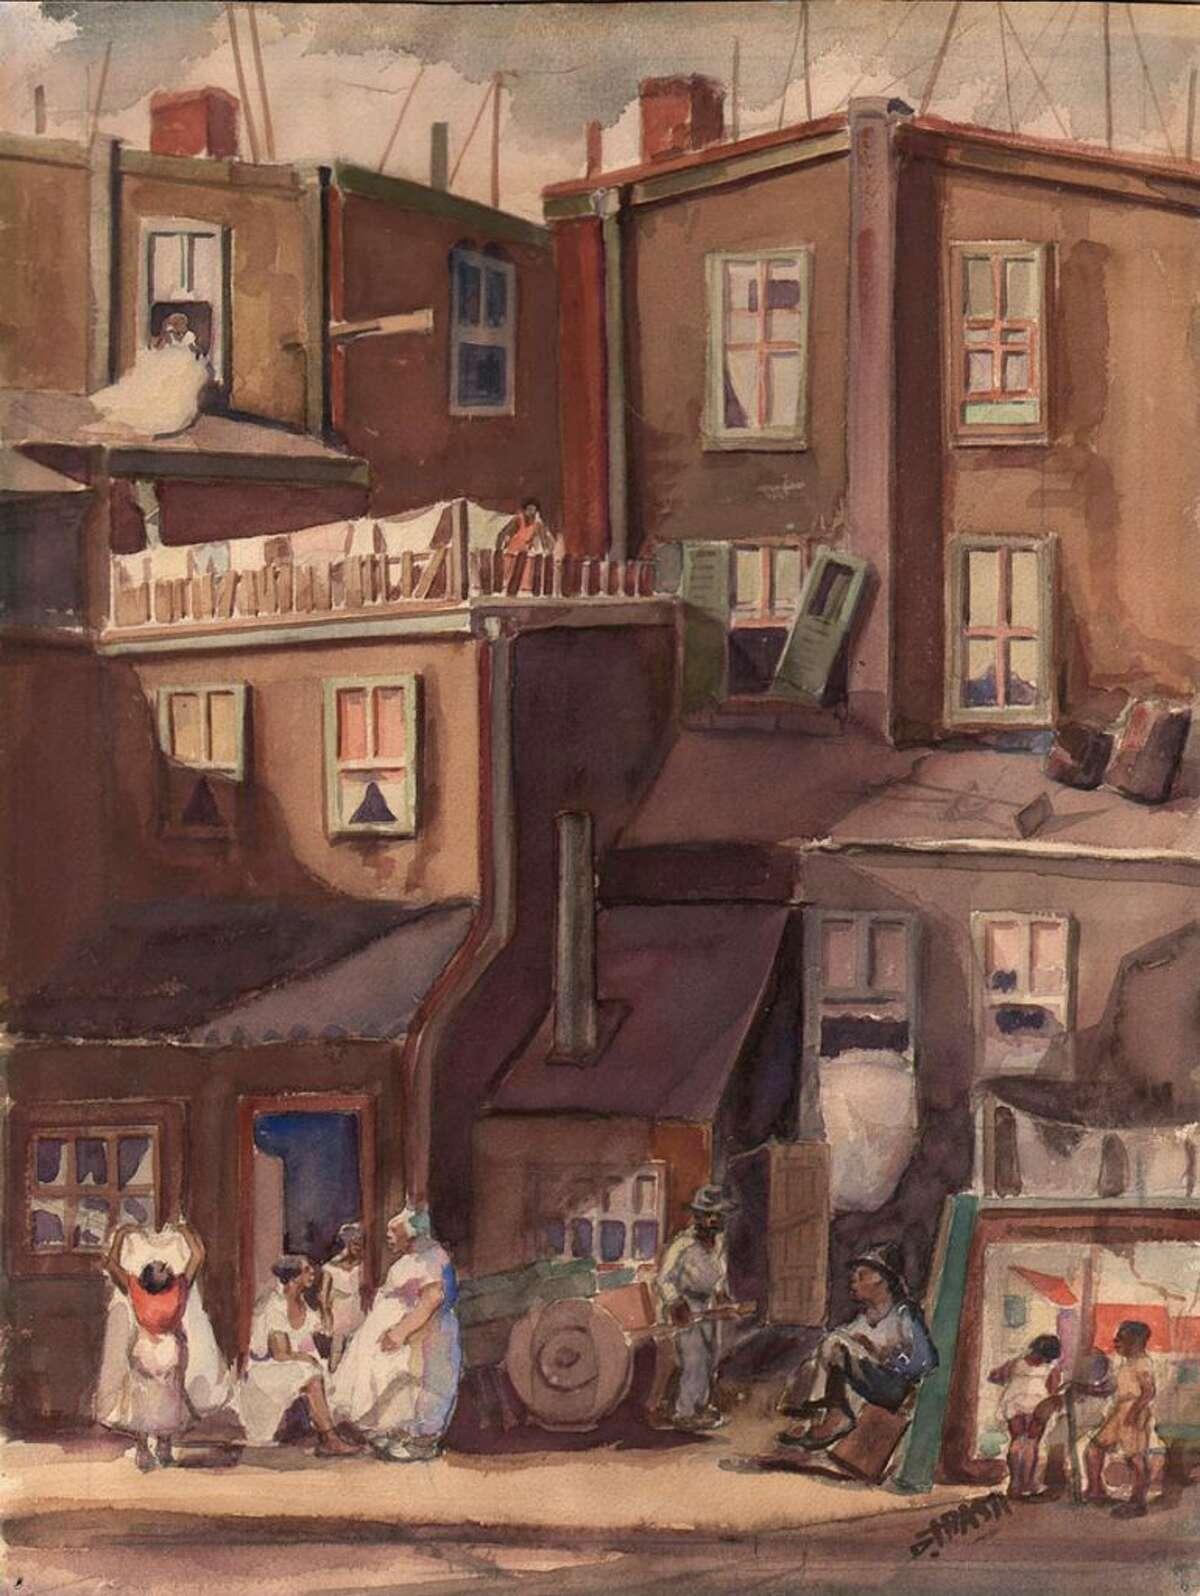 Dox Thrash, Black Life, and the Carborundum Mezzotint: Opens Jan. 21,Hyde Collection, Glens Falls